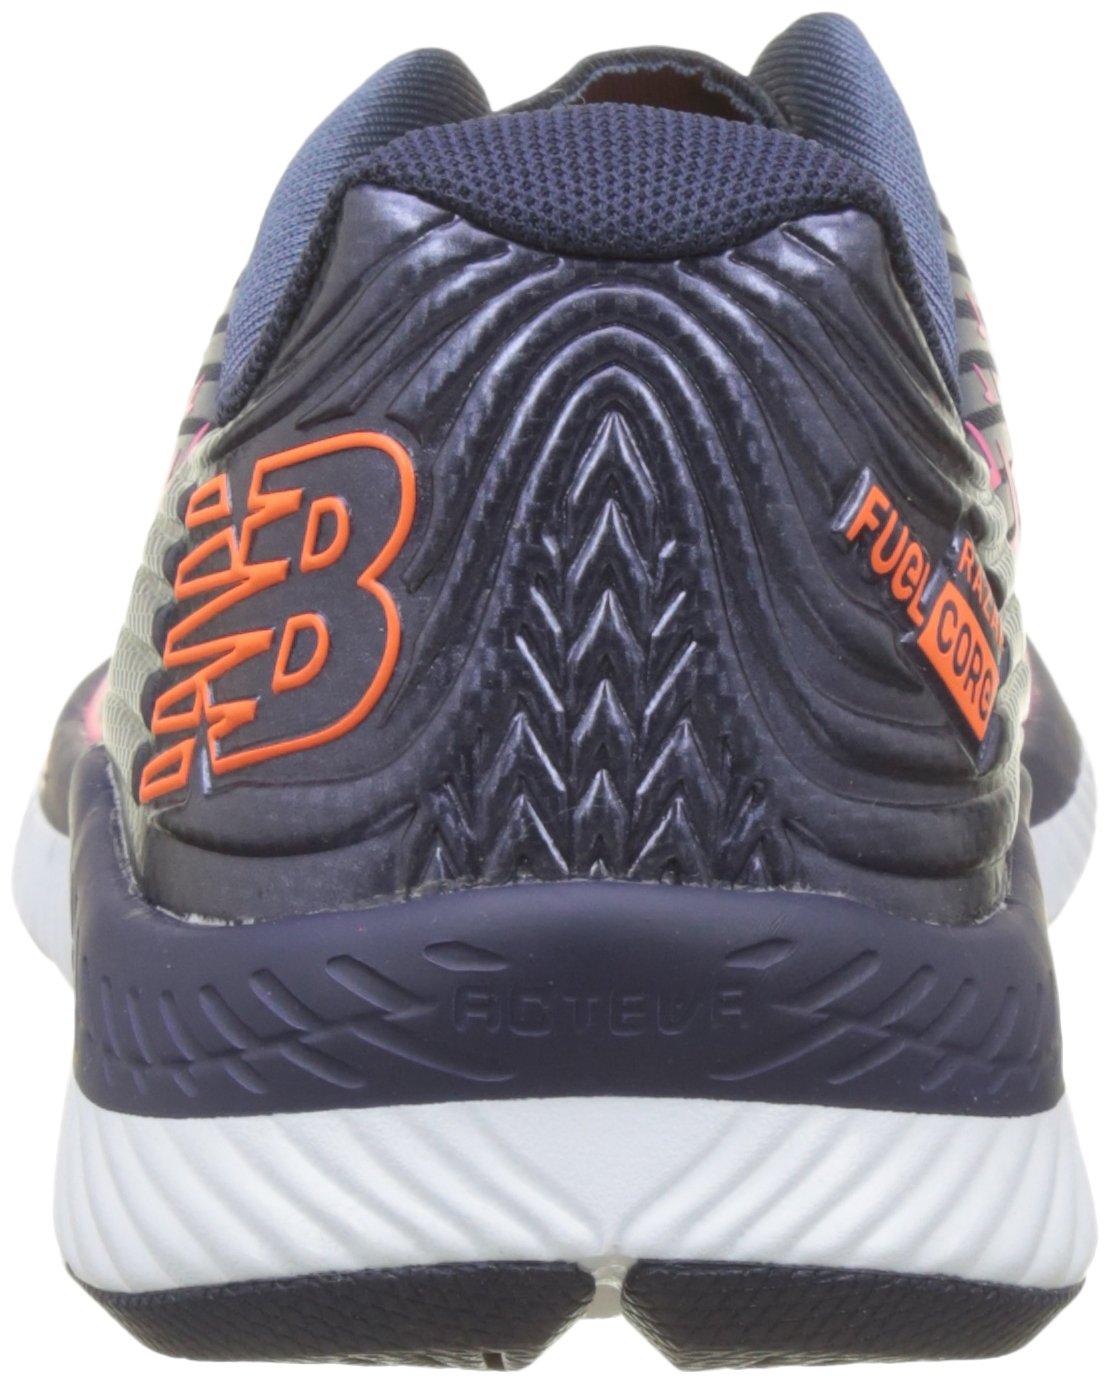 New Balance Women's Razah V1 Running Shoe B01N43MHN9 12 B(M) US|Alpha Pink/Dark Cyclone